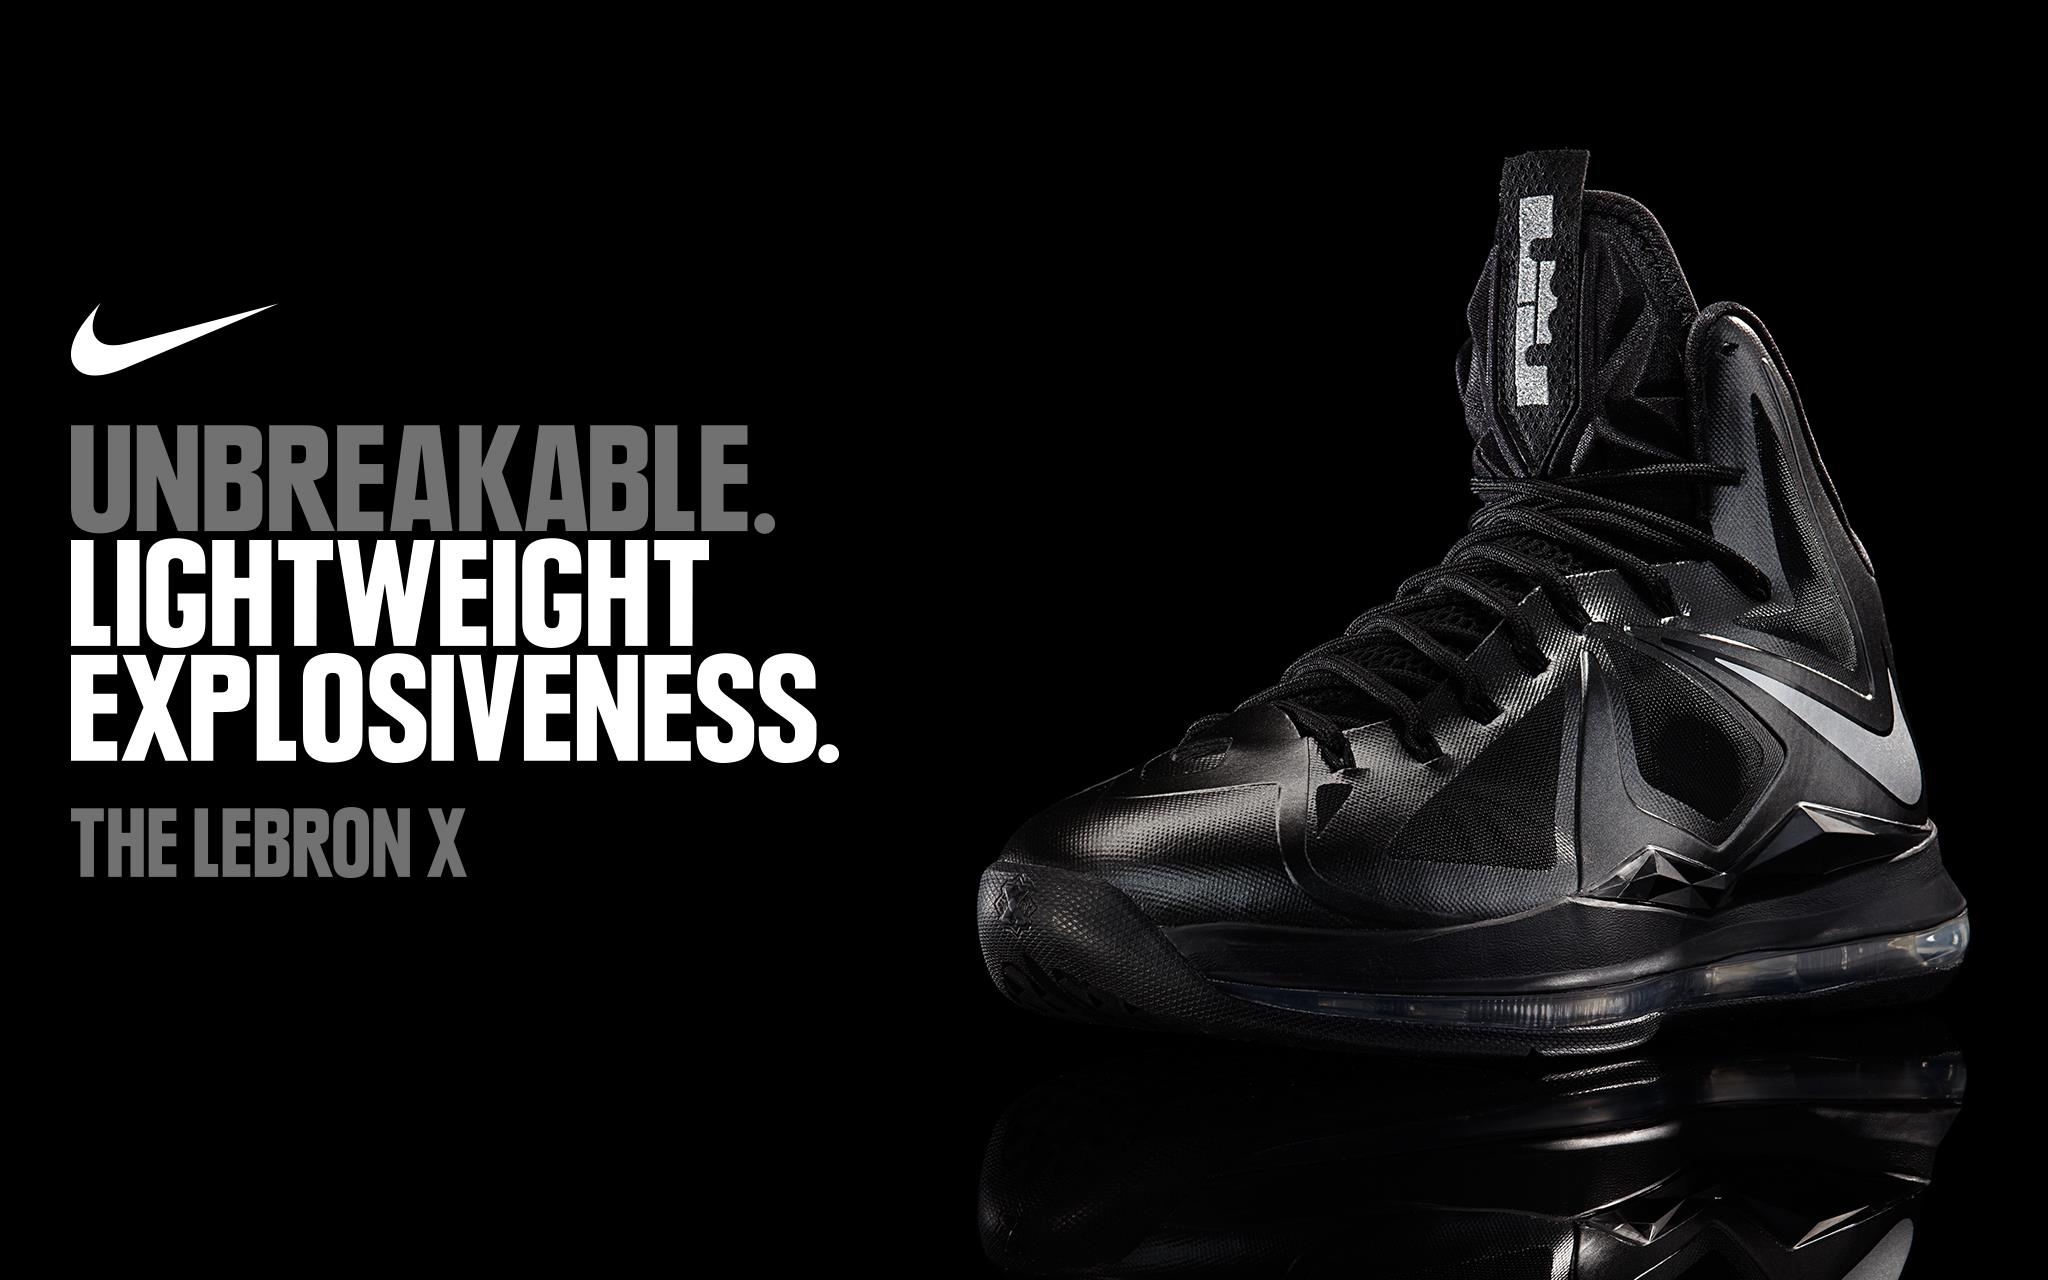 Nike Lebron X Wallpaper | Wallpup.com